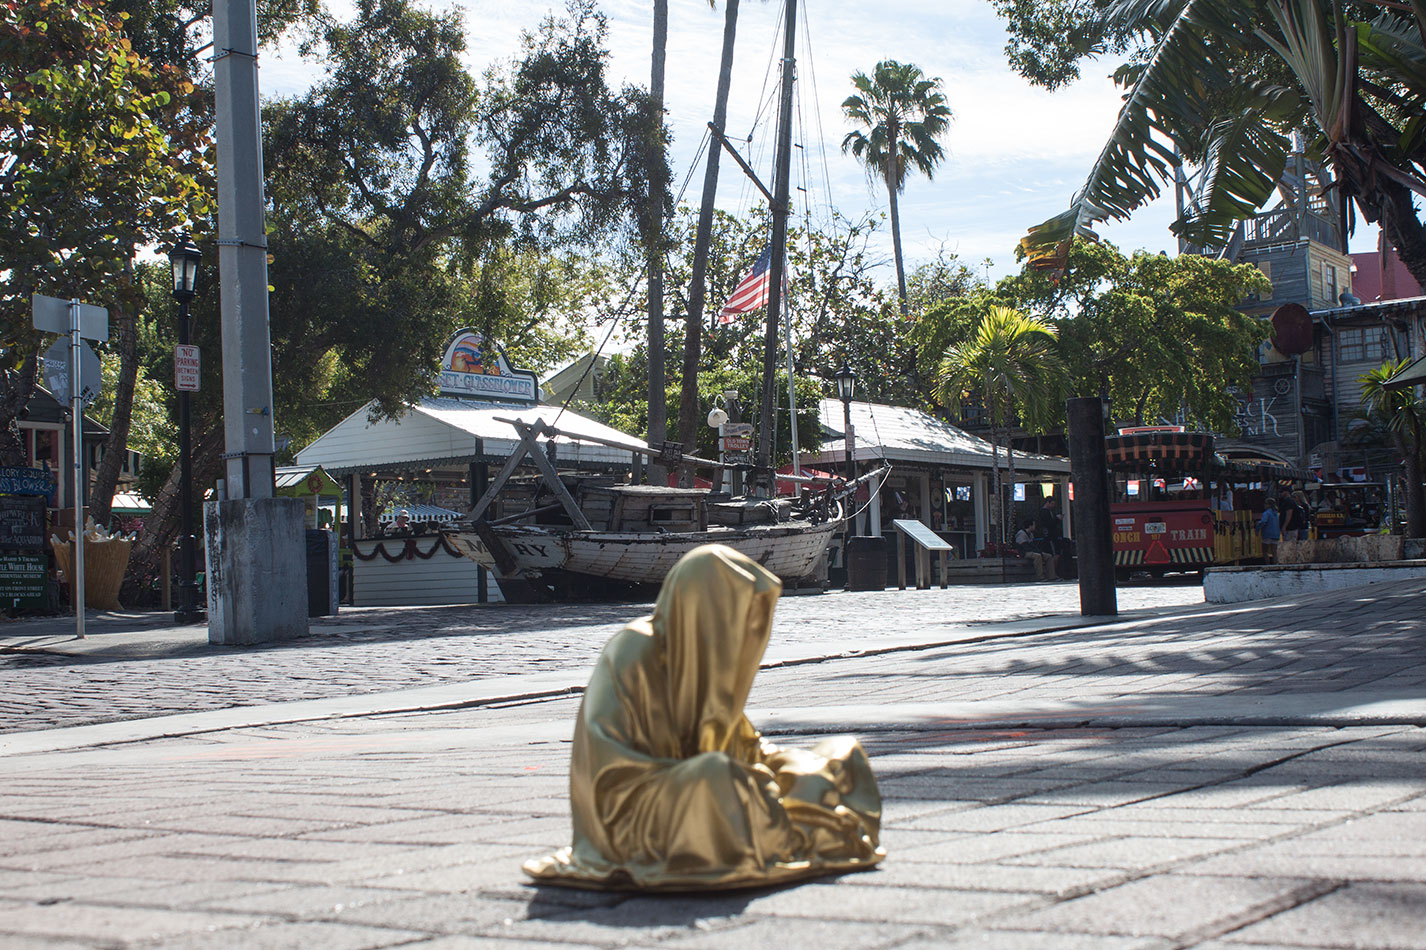 public-art-basel-miami-beach-fair-usa-florida-guardians-of-time-manfred-kili-kielnhofer-contemporary-fine-art-modern-arts-design-antiques-sculpture-6767